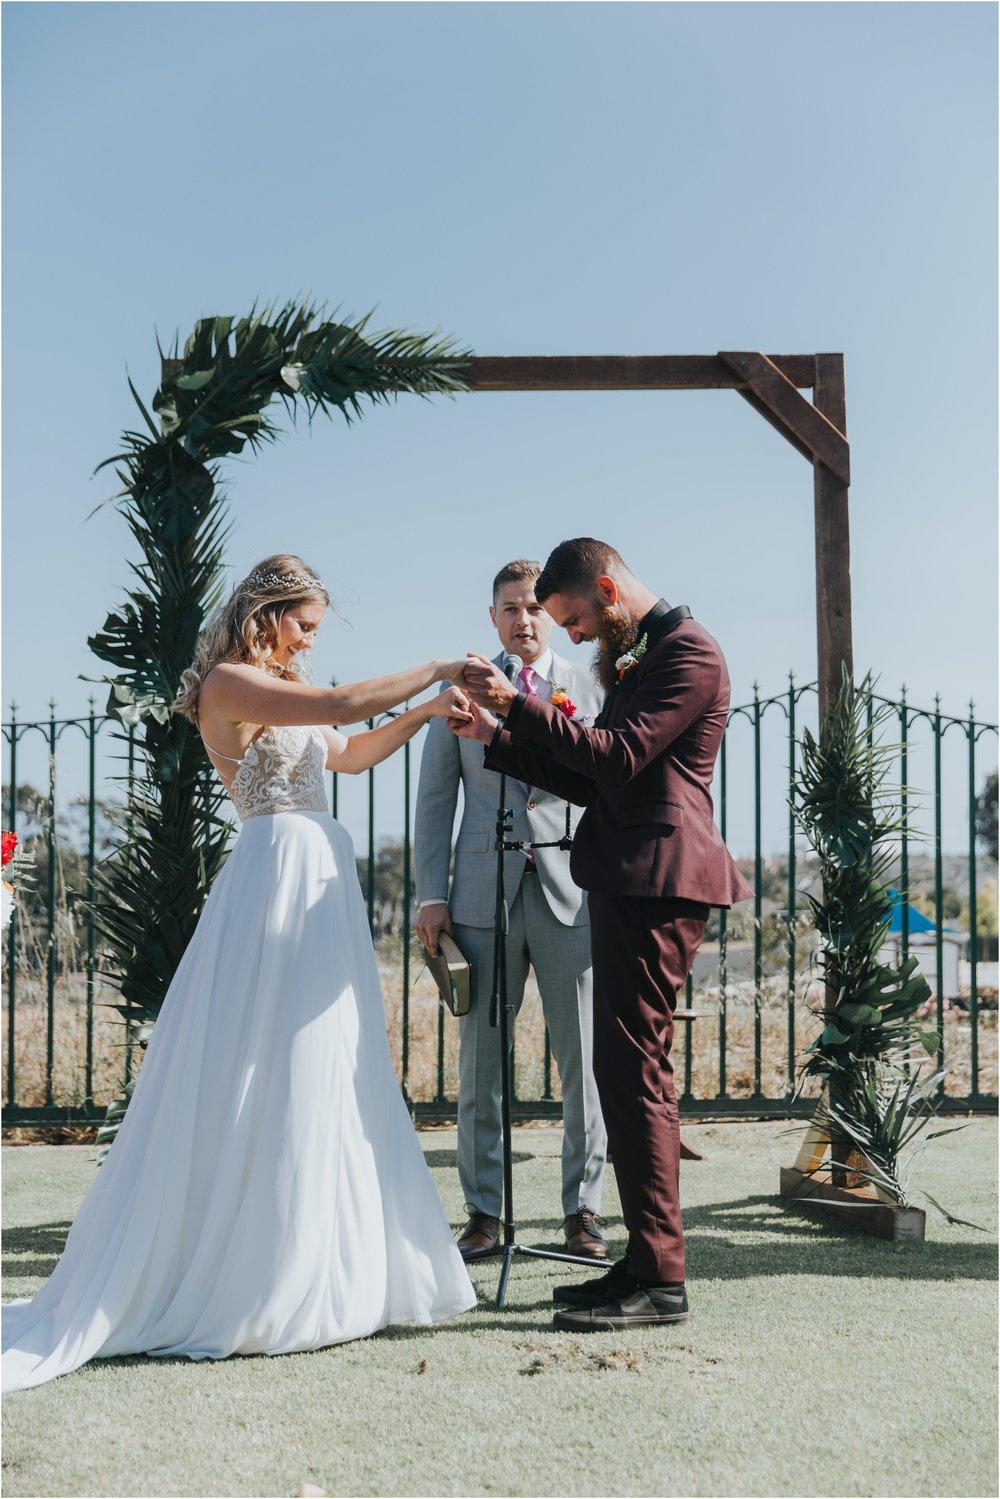 newland_barn_wedding_huntington_beach20181112_060.jpg